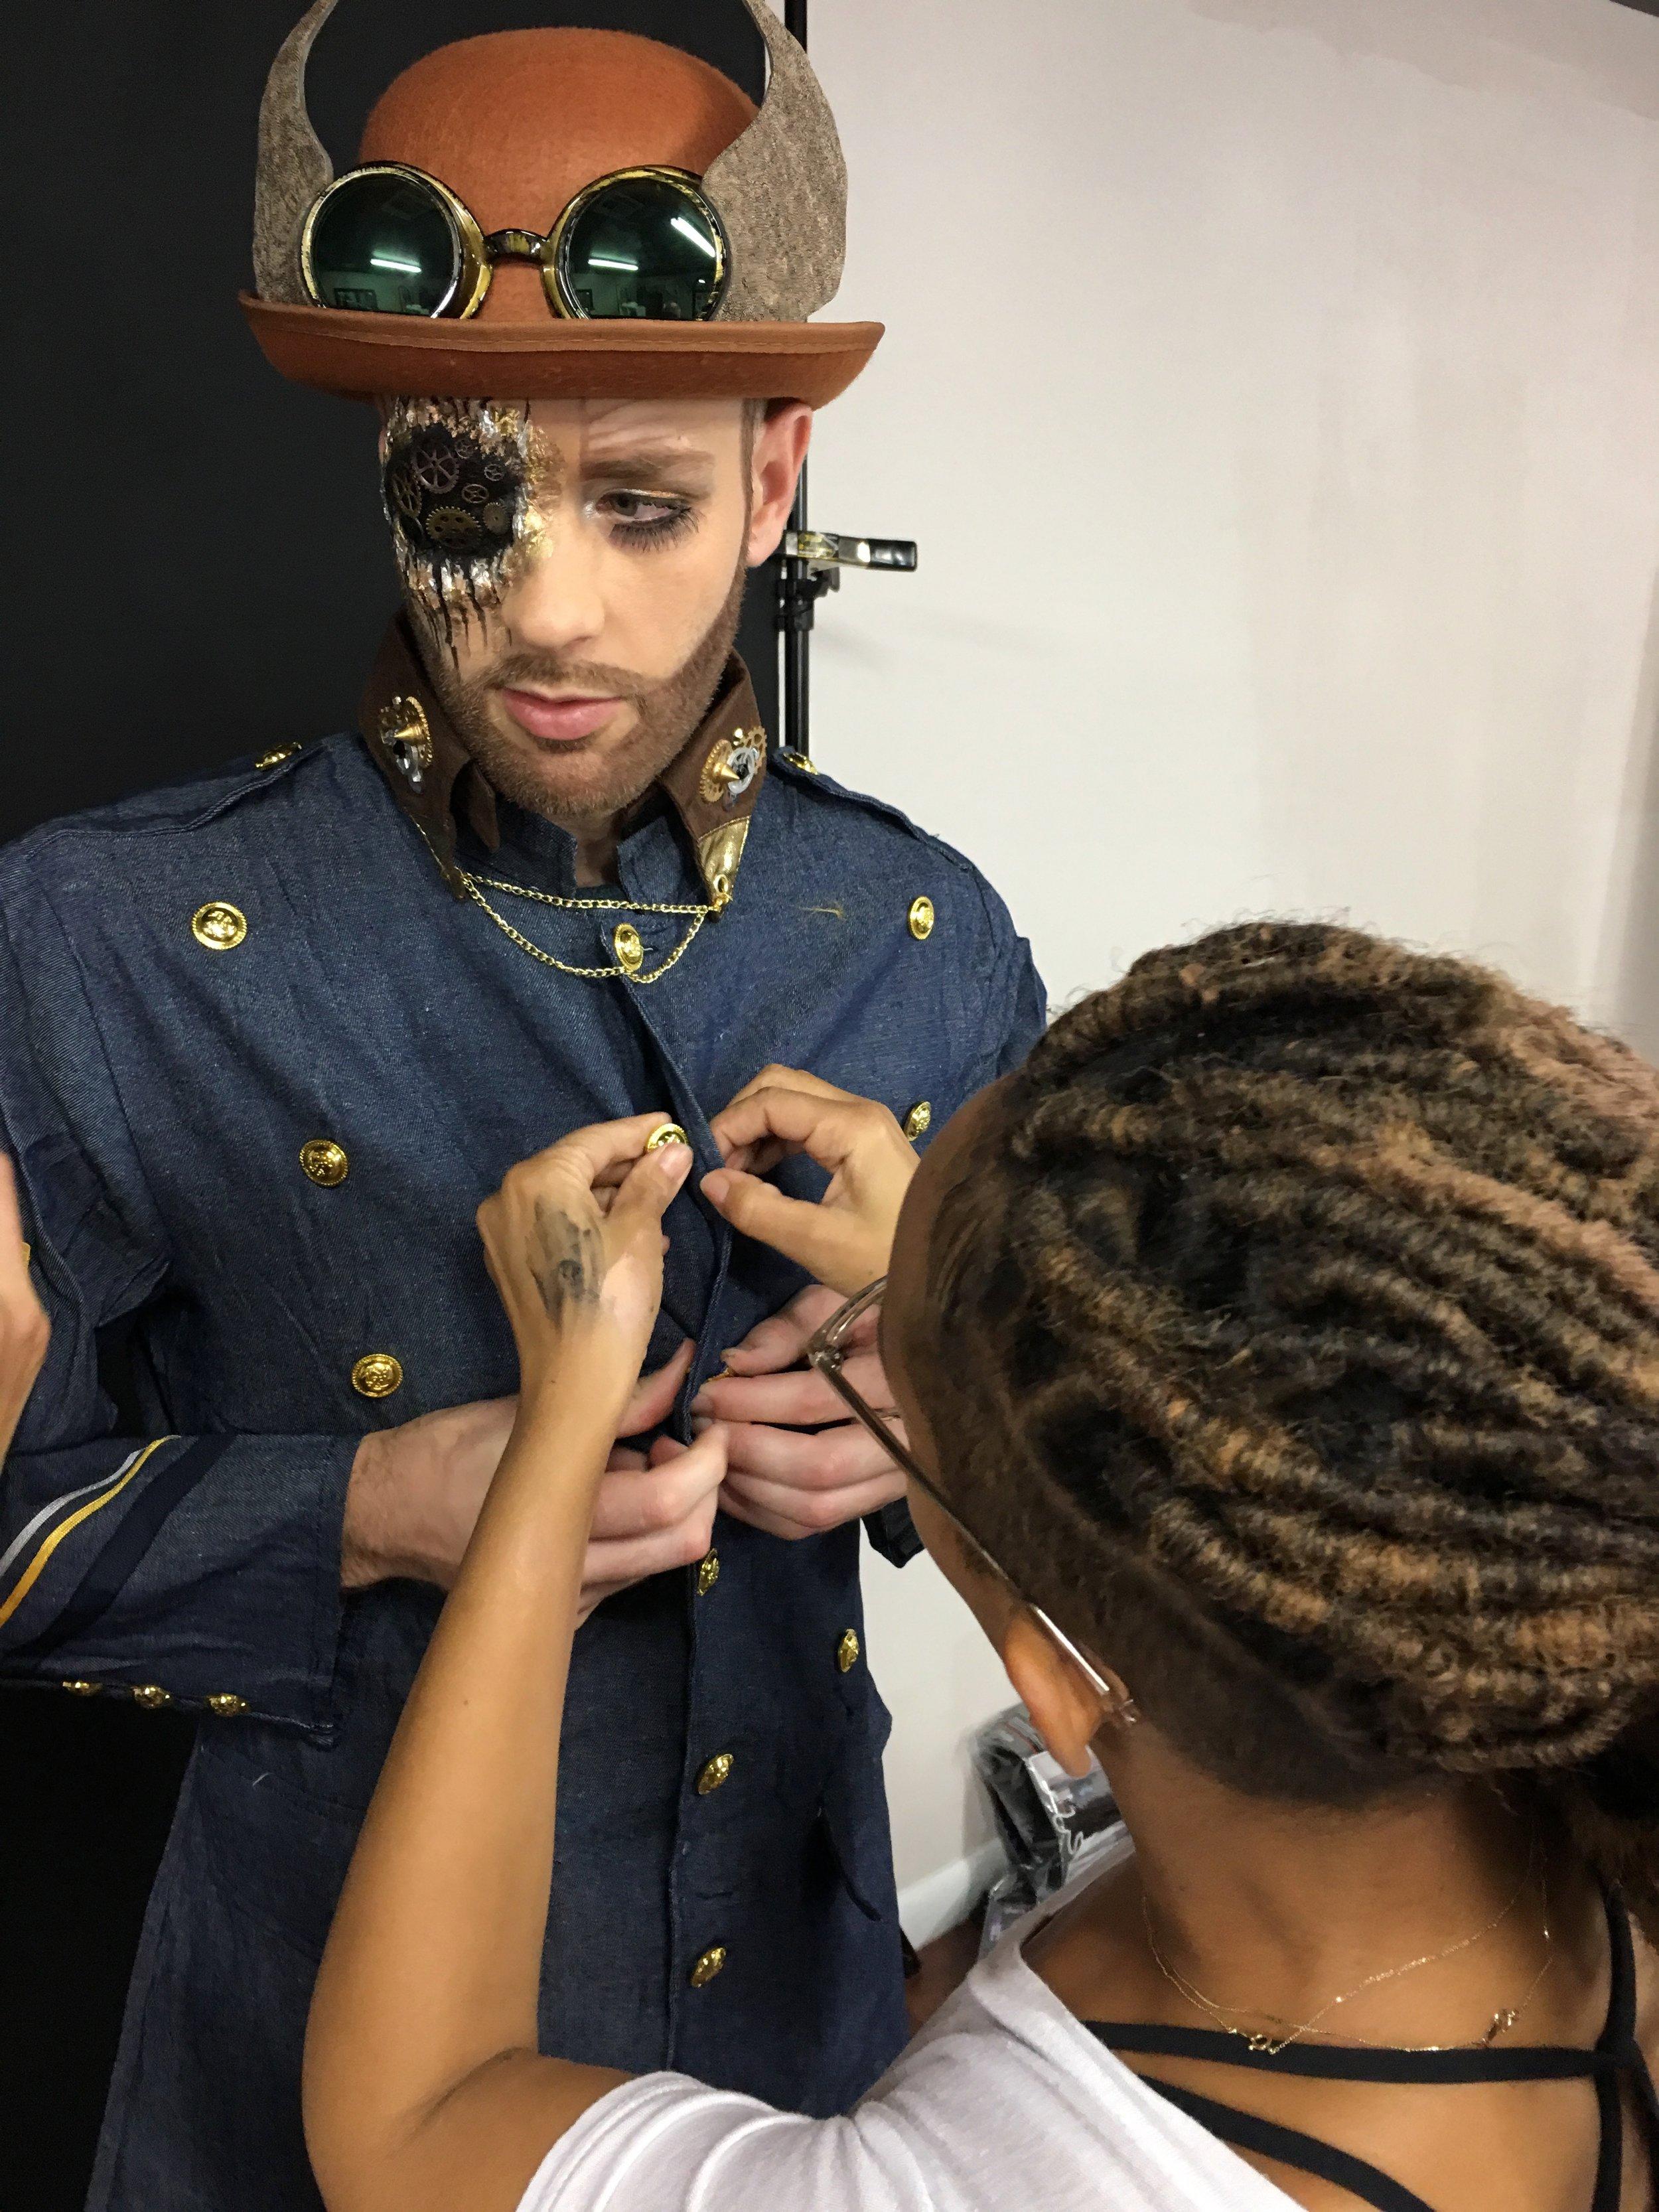 From Makeup Artist to Wardrobe Stylist- haha!